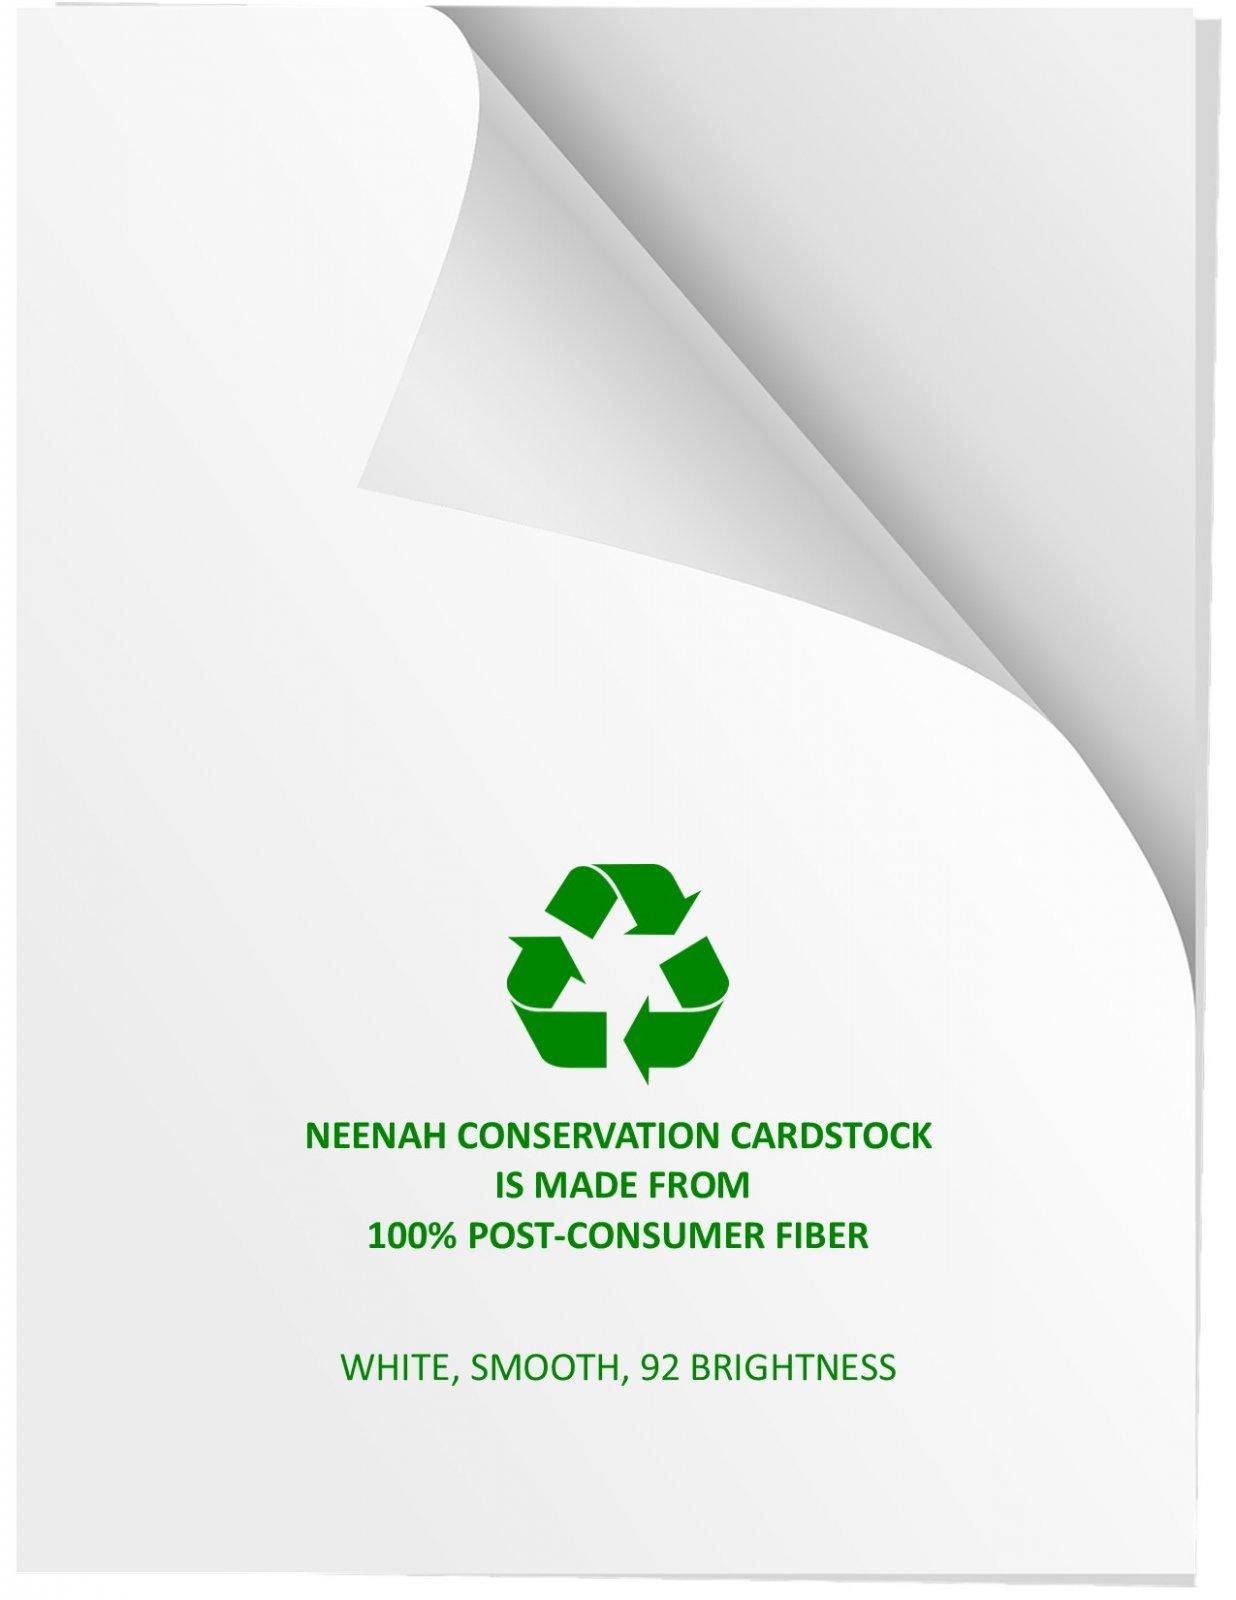 Neenah Conservation Cardstock, 100% post-consumer, chlorine-free